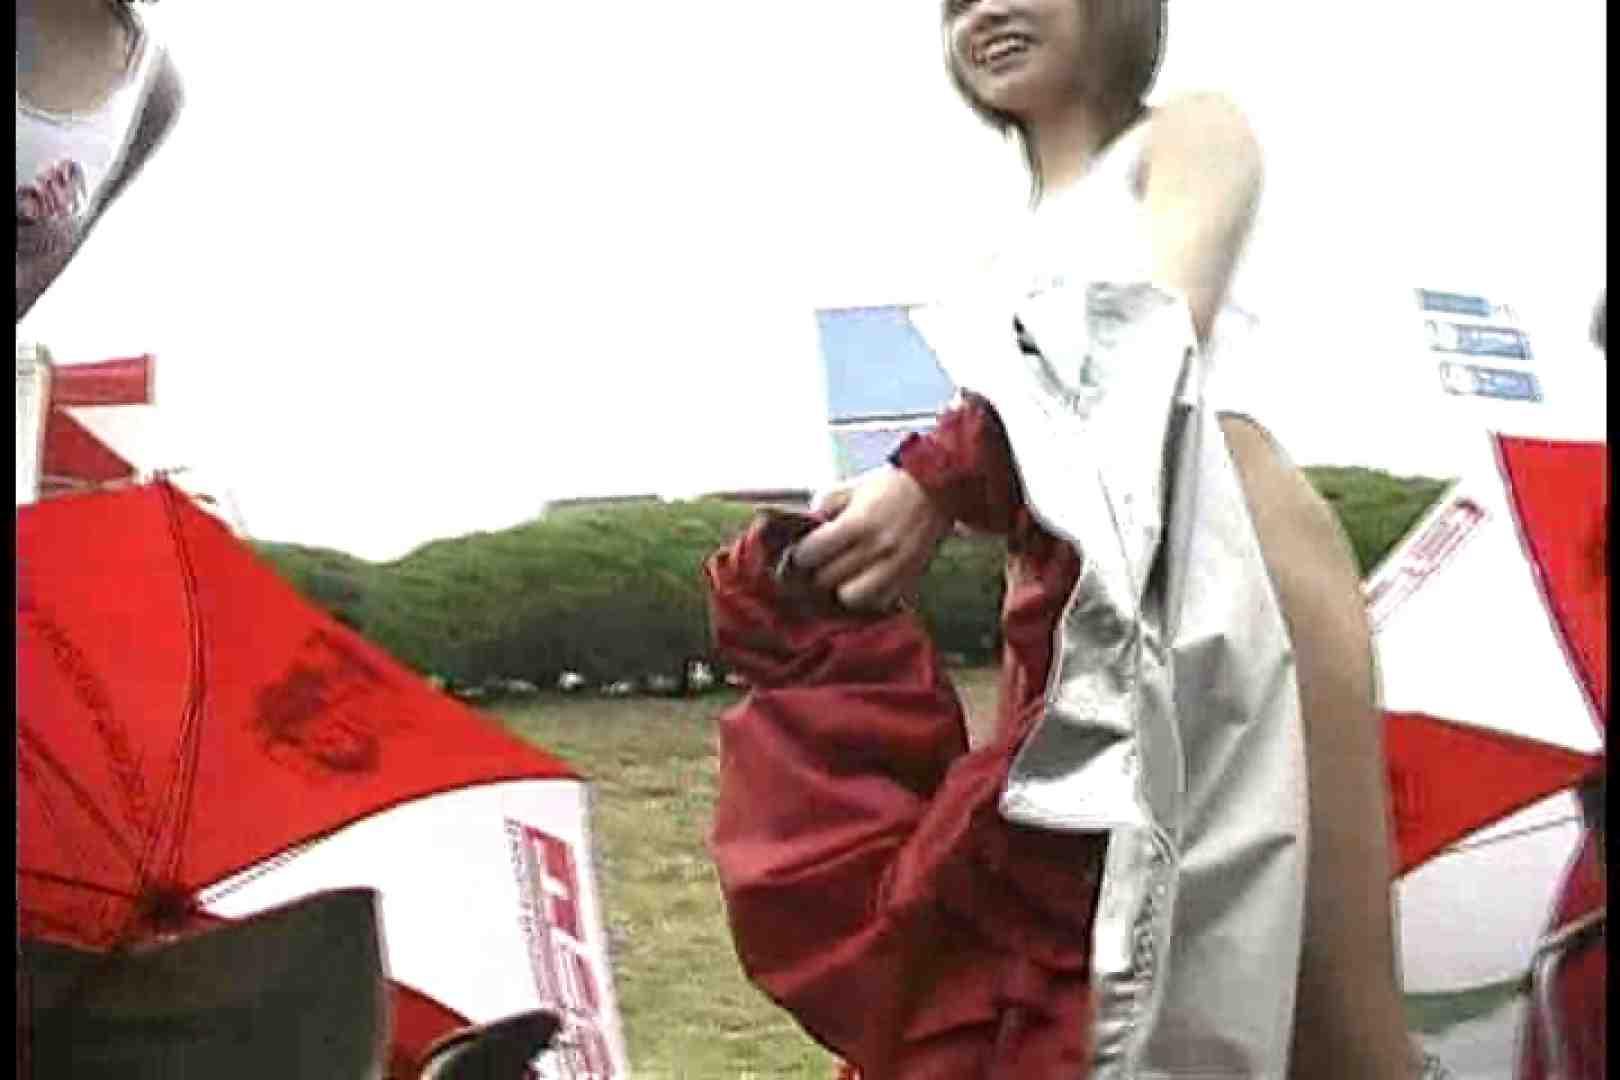 RQカメラ地獄Vol.3 OLセックス 隠し撮りオマンコ動画紹介 64画像 14